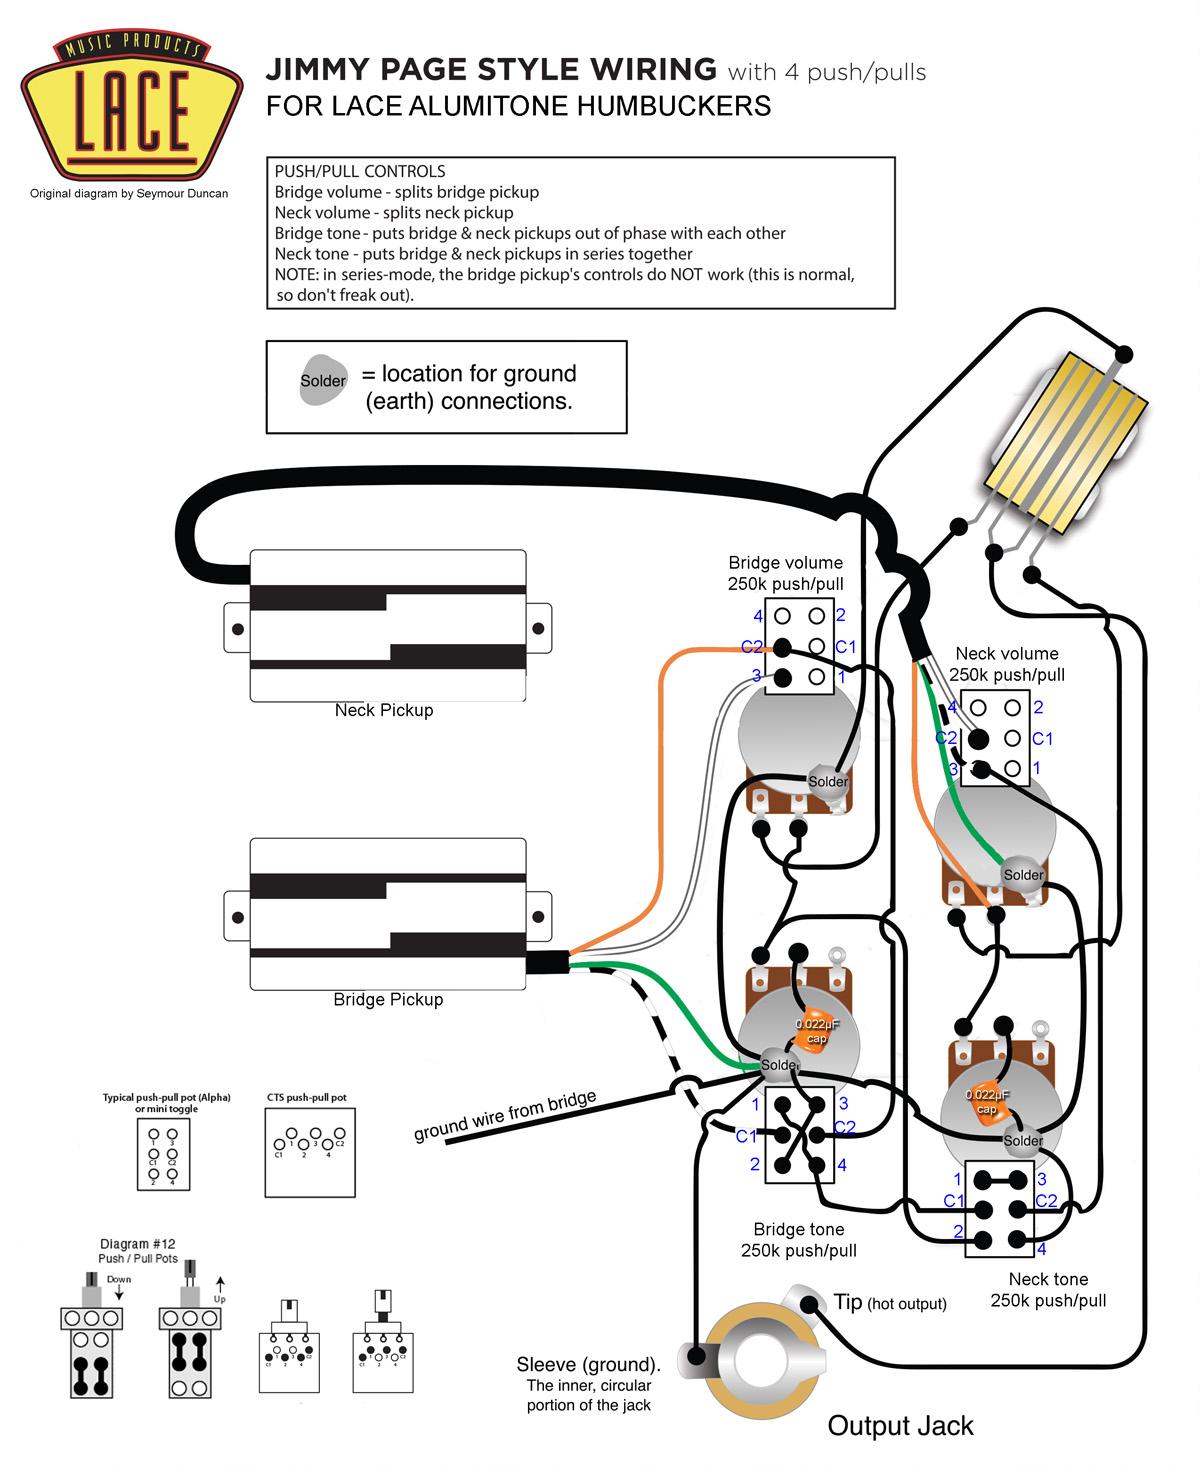 telecaster alumitone wiring diagram wiring diagram schematicslace wiring diagram wiring diagram lace alumitone split wiring wiring diagram data schemalace pickup wiring wiring